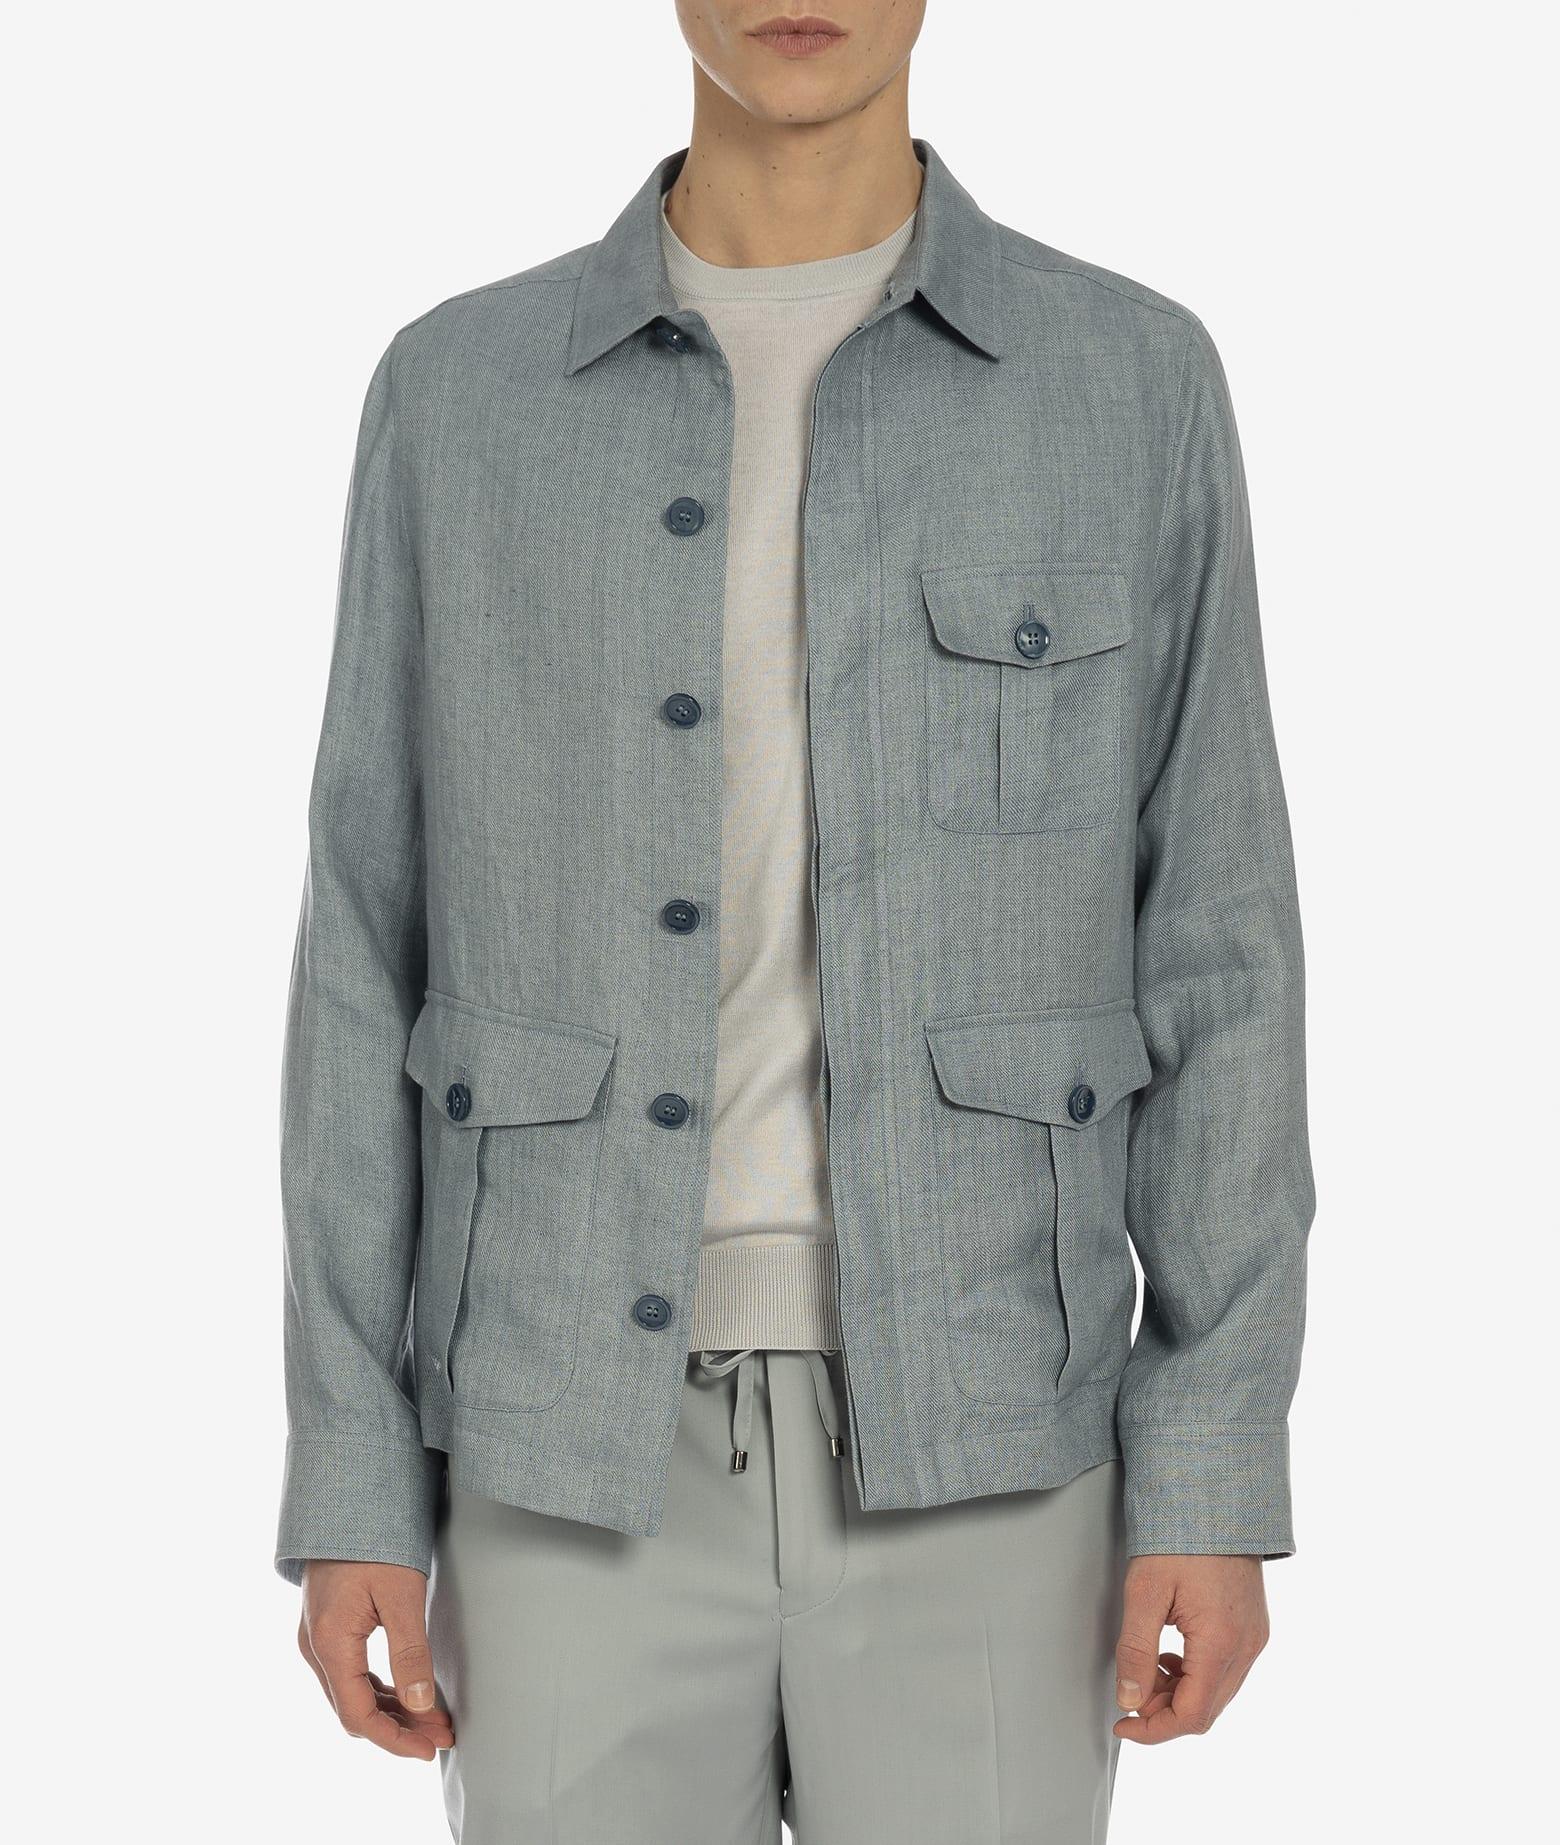 matera Sahara Jacket